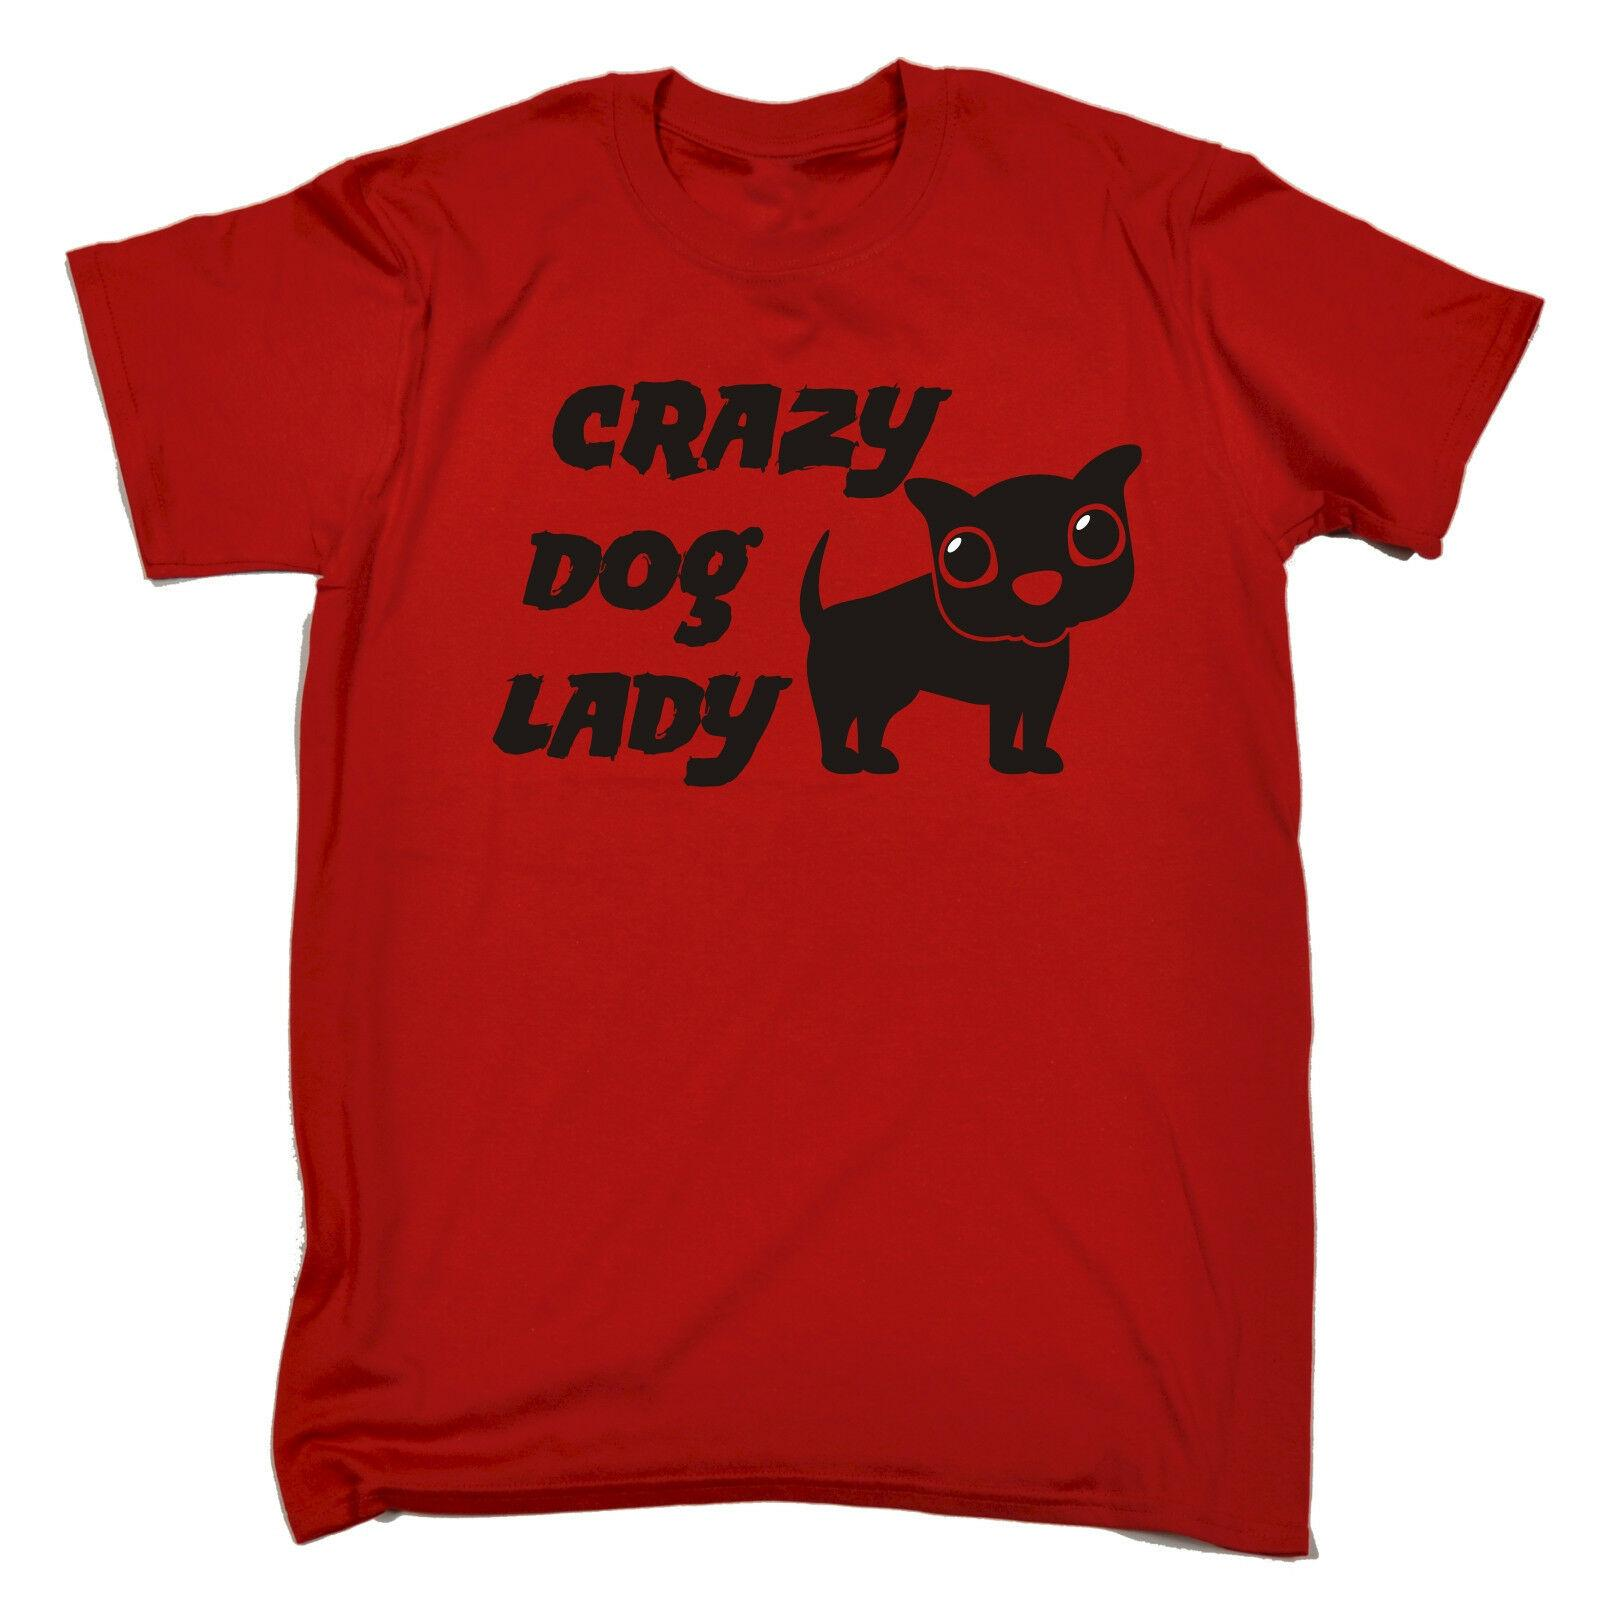 Crazy Dog Lady MENS T SHIRT Tee Birthday Cute Puppy Mum Auntie Grandma Funny Men Women Unisex Fashion Tshirt Shirt Sites 1 From